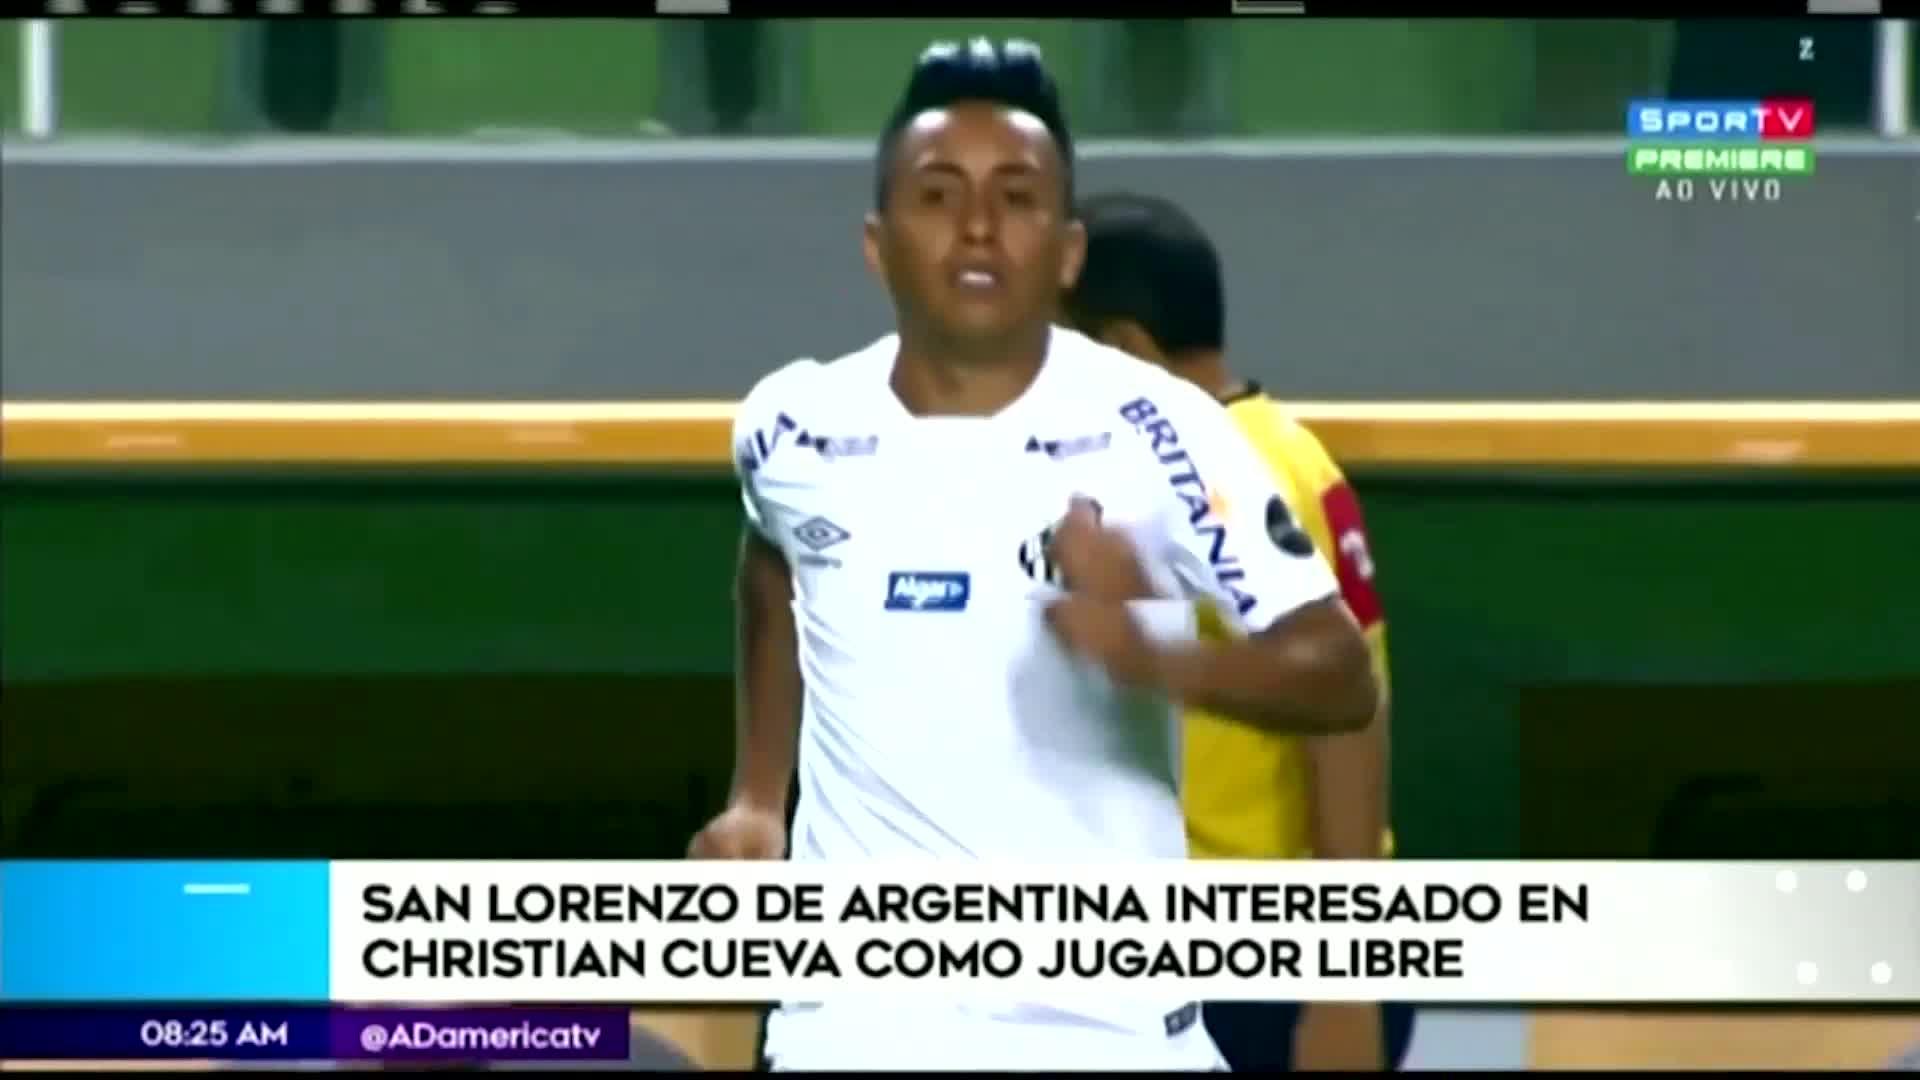 Christian Cueva podría llegar como jugador libre a San Lorenzo de Argentina